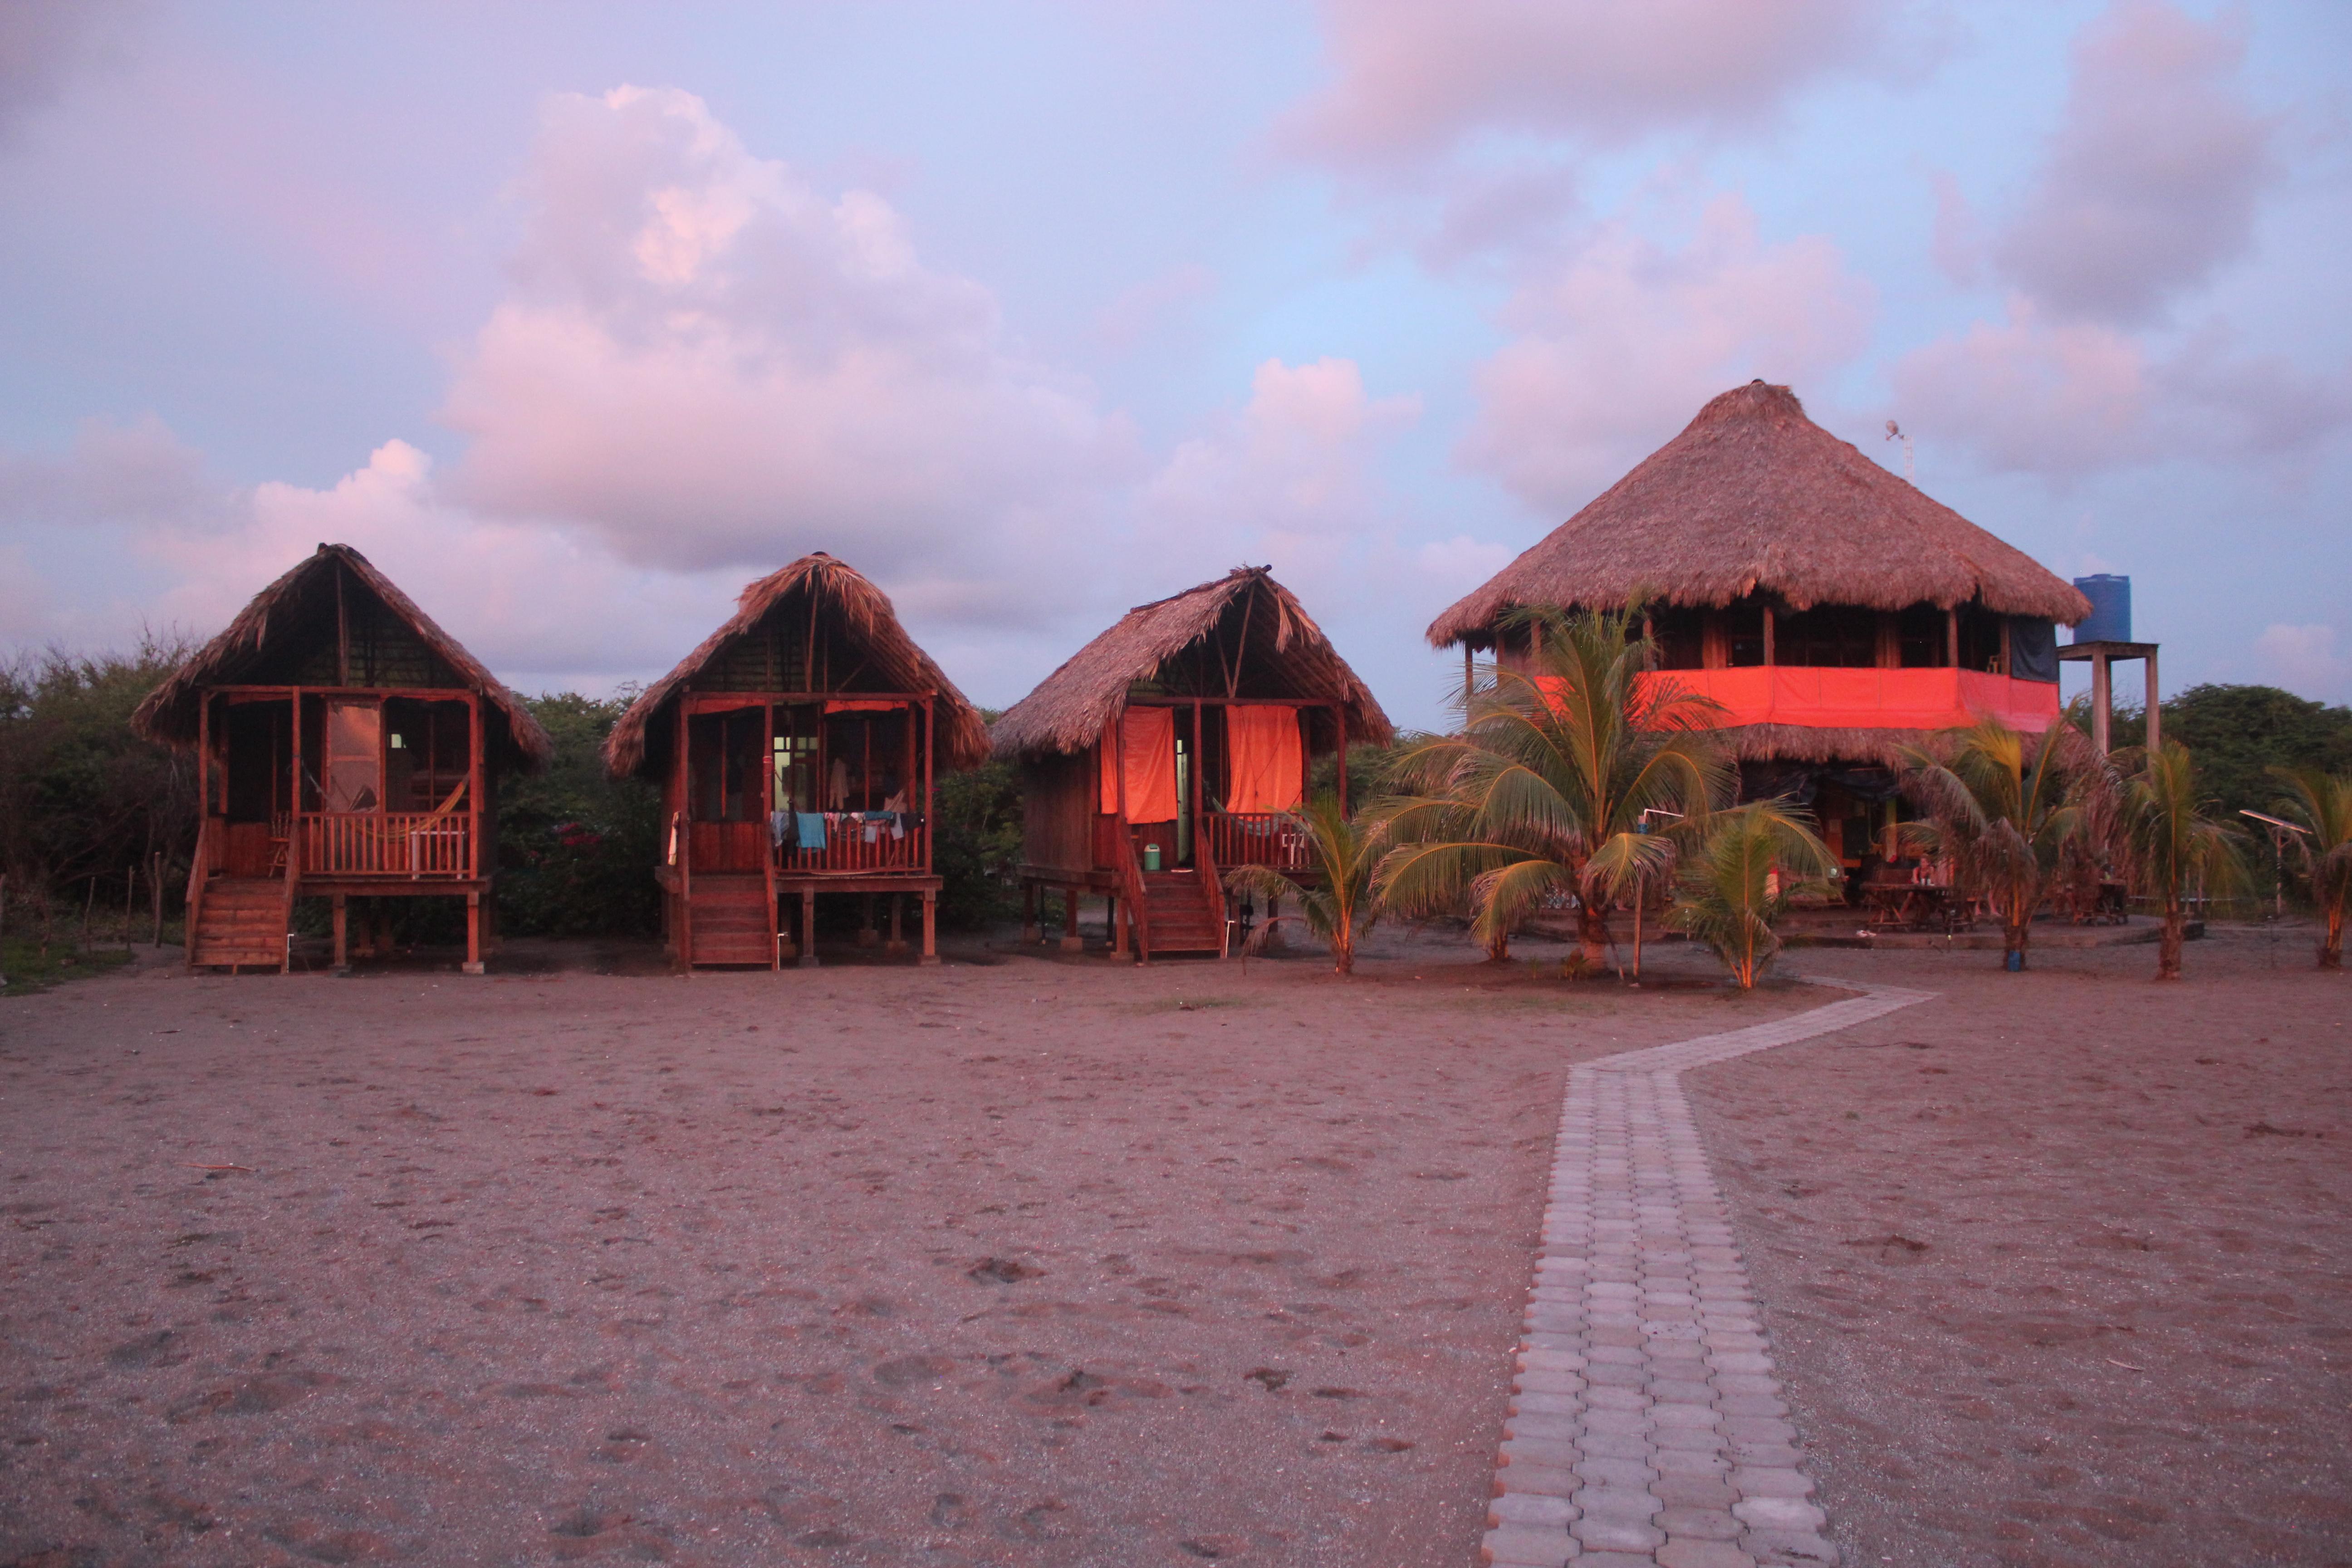 Sunset Bungalows; Isla Los Brasiles, Nicaragua; 2013